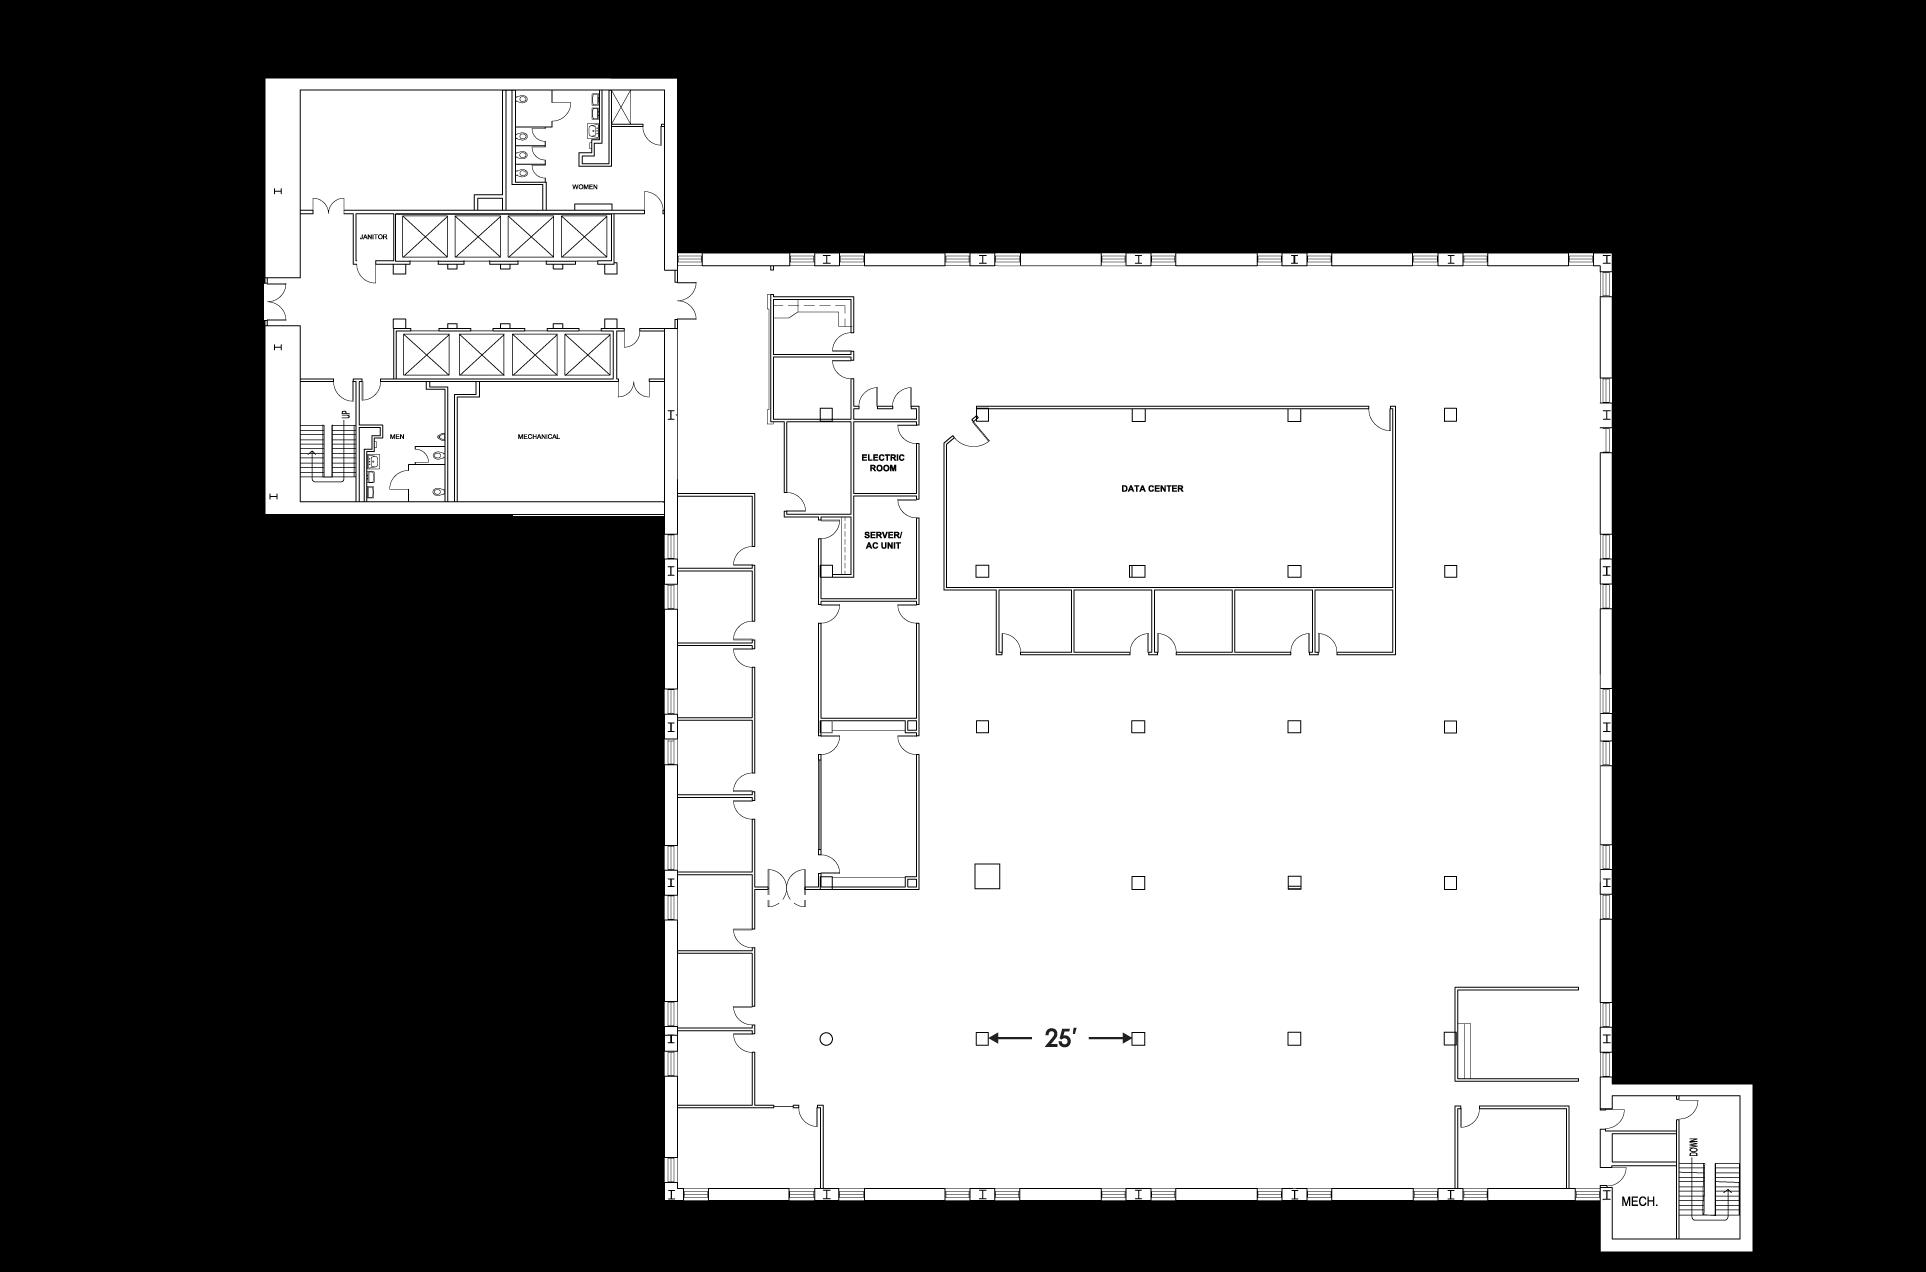 Tower 1 Floor 2 Floorplan Image